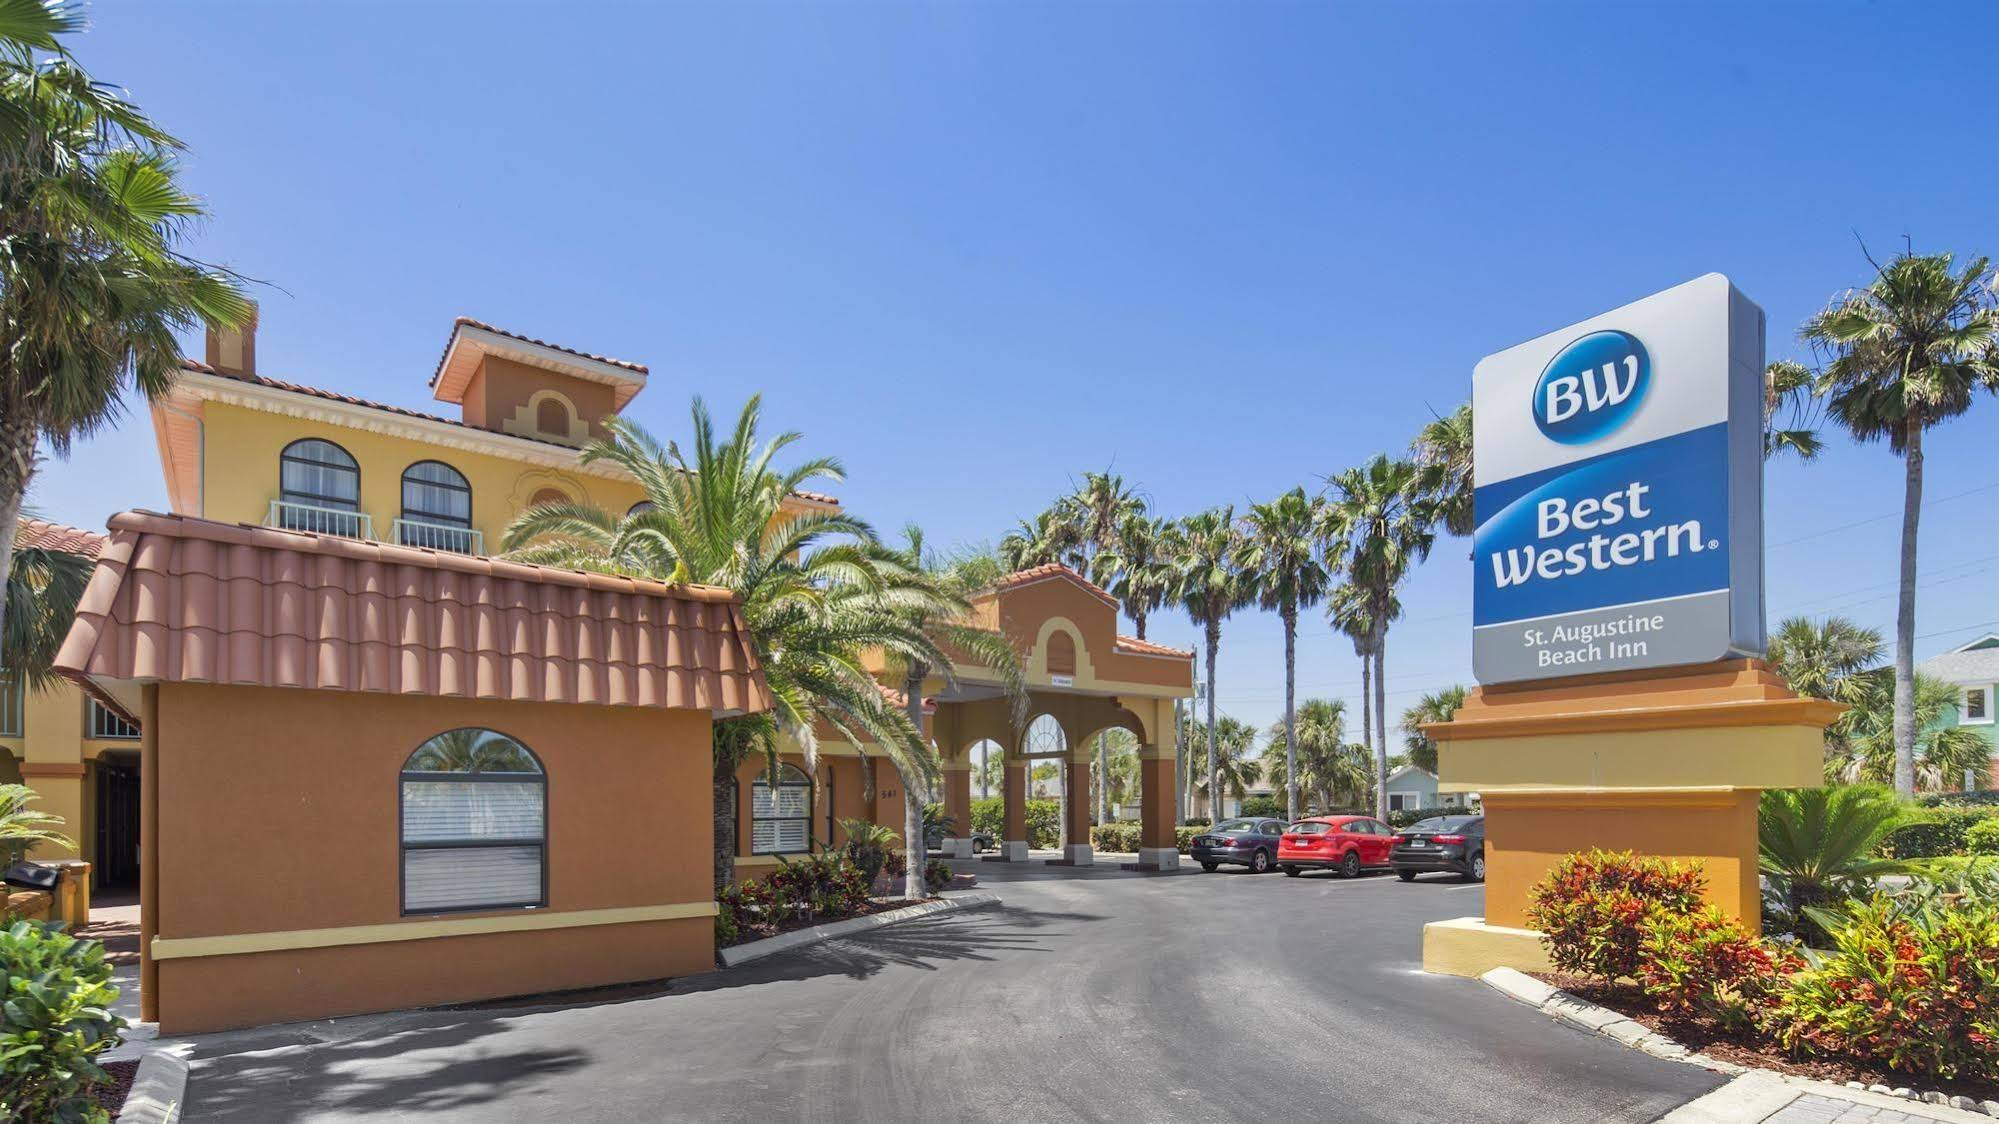 Best Western Seaside Inn st. Augustine Beach